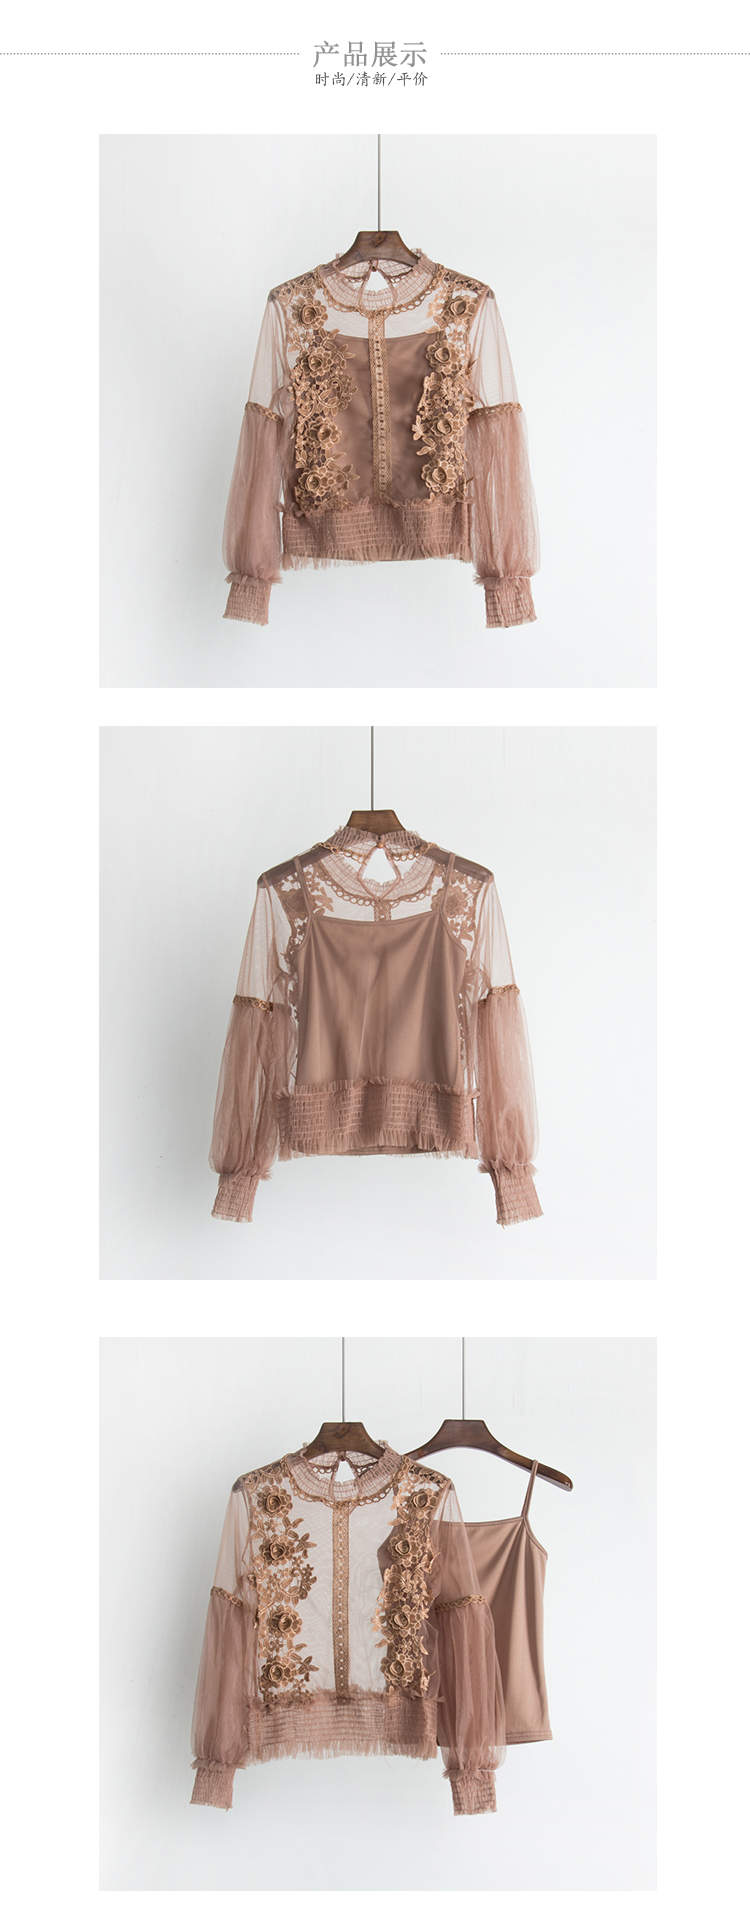 2018 Sweet Long Lantern Sleeve Transparent Hollow Out Mesh Blouses Women Two Pcs Set 3D Flower Mesh Shirts Sweet Flower Mesh Top 8